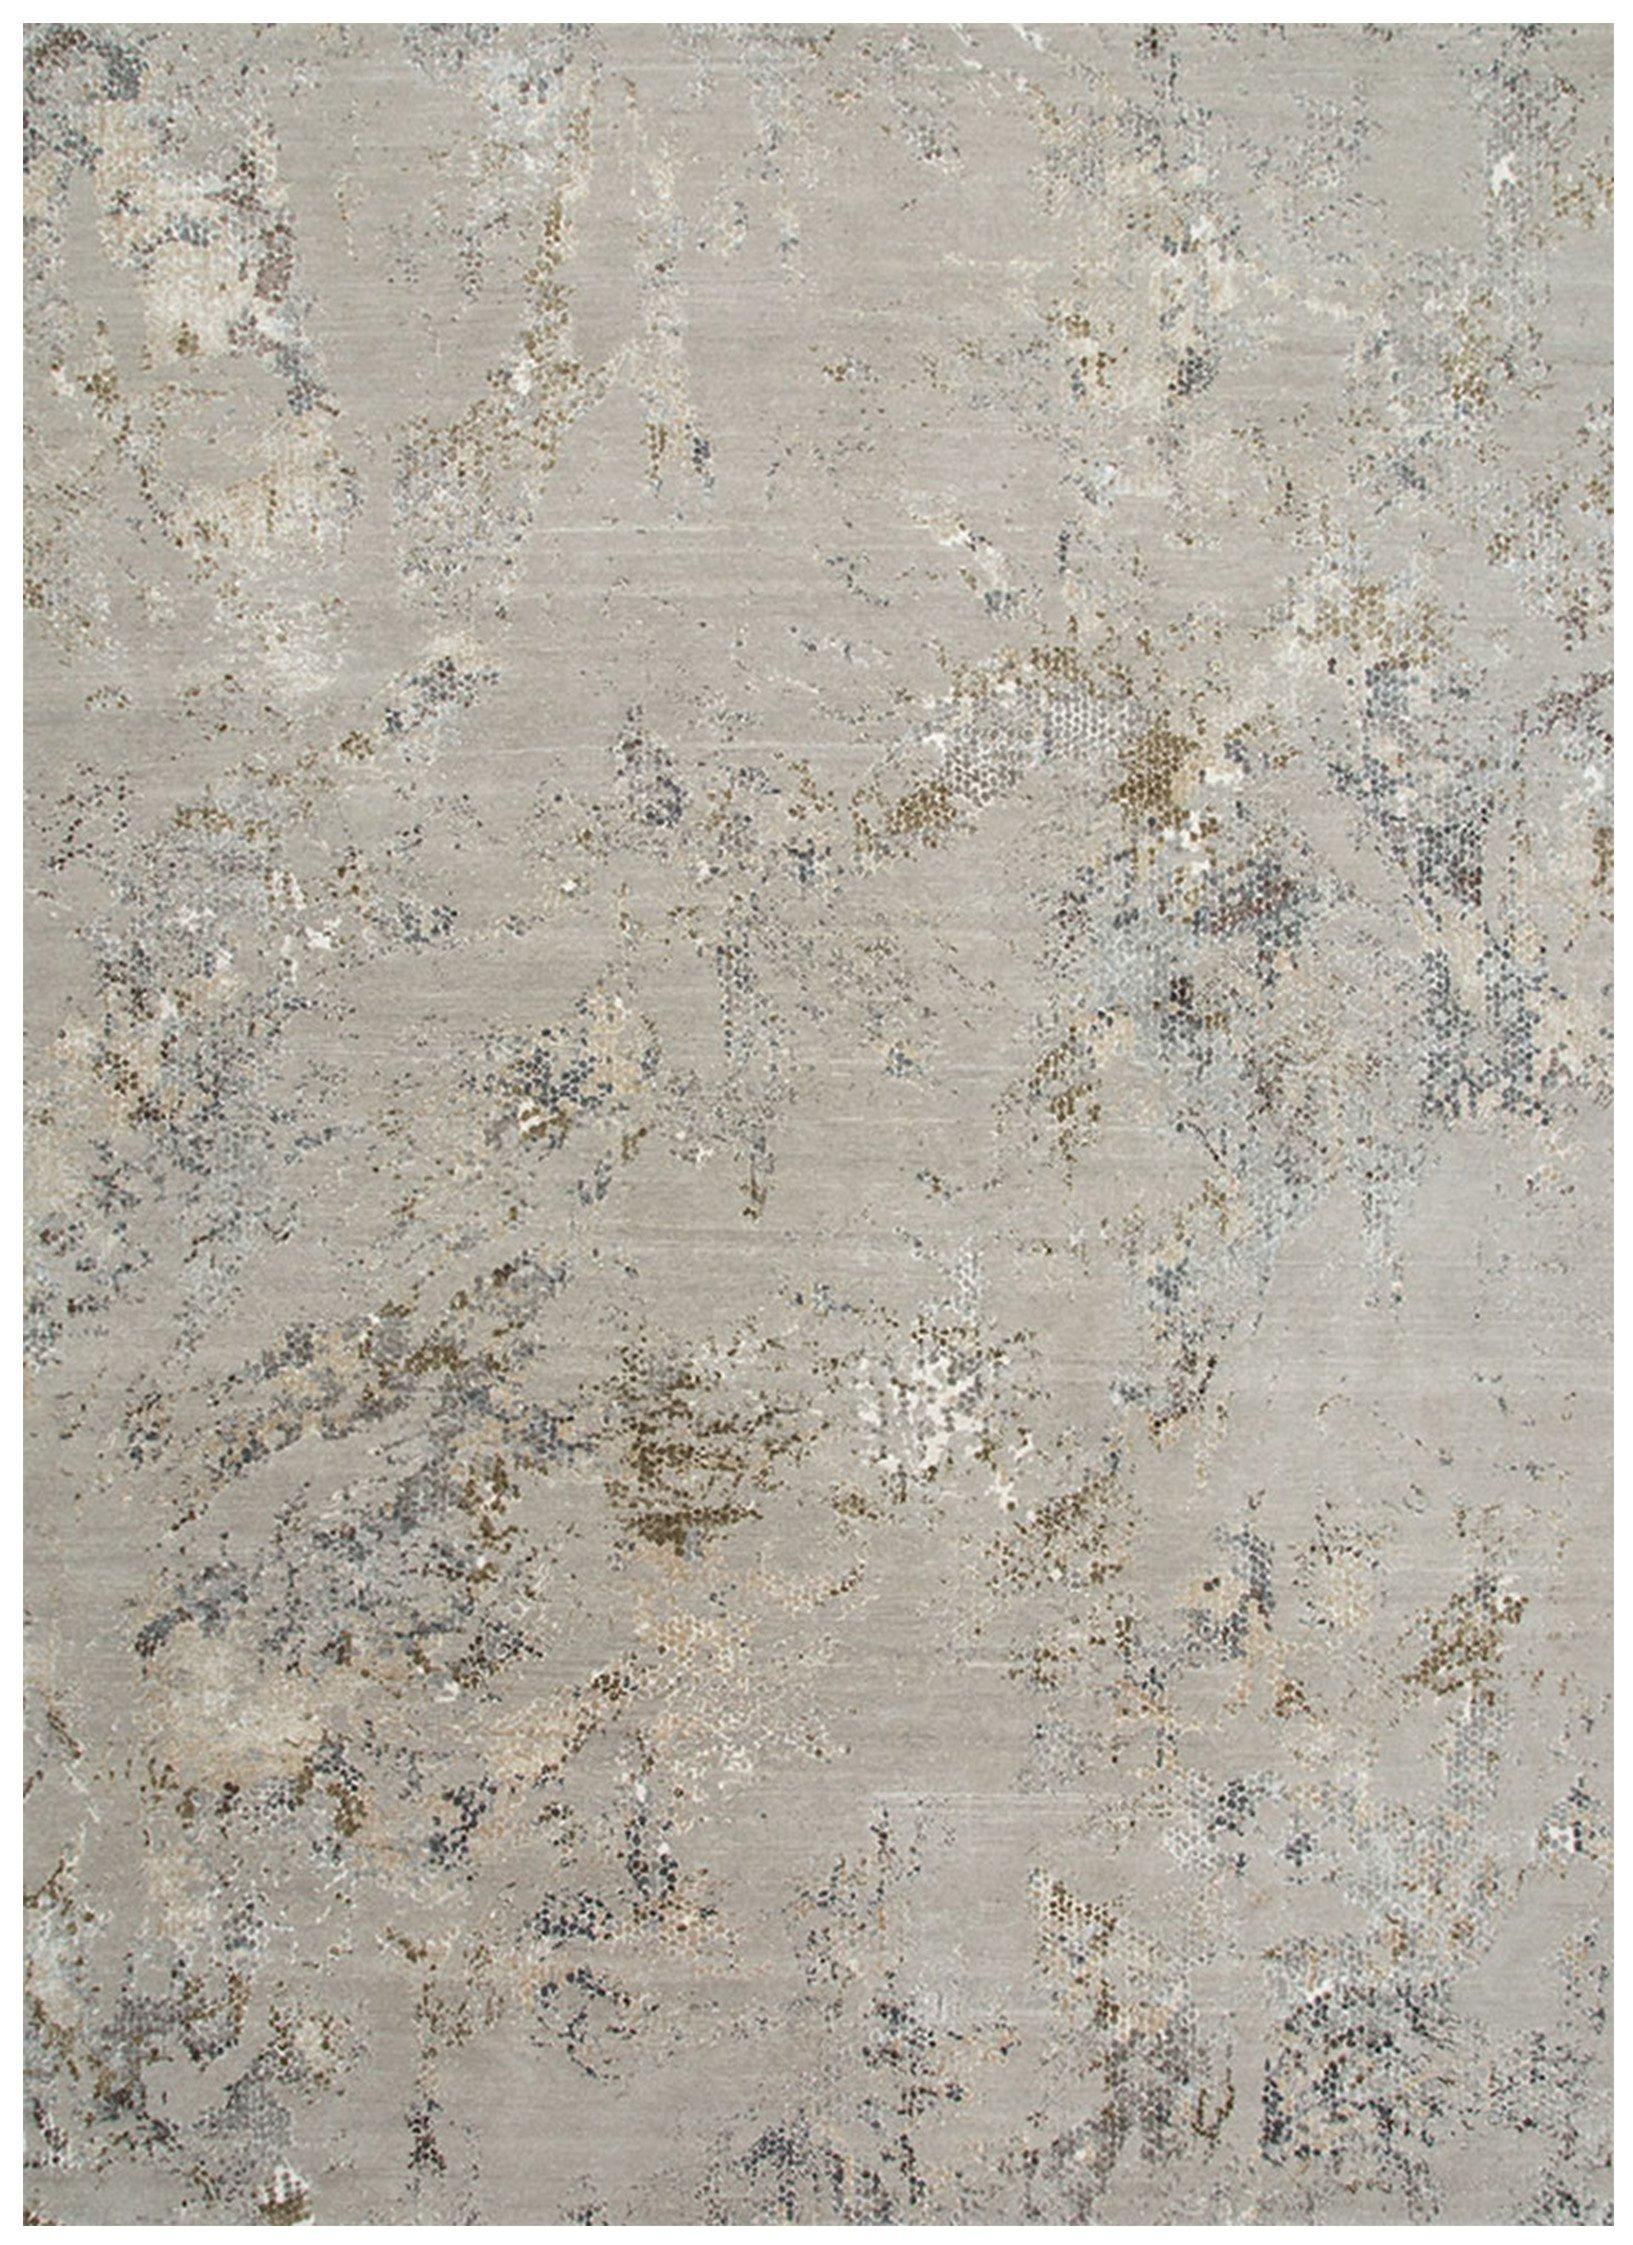 LaDatina_handmade carpets